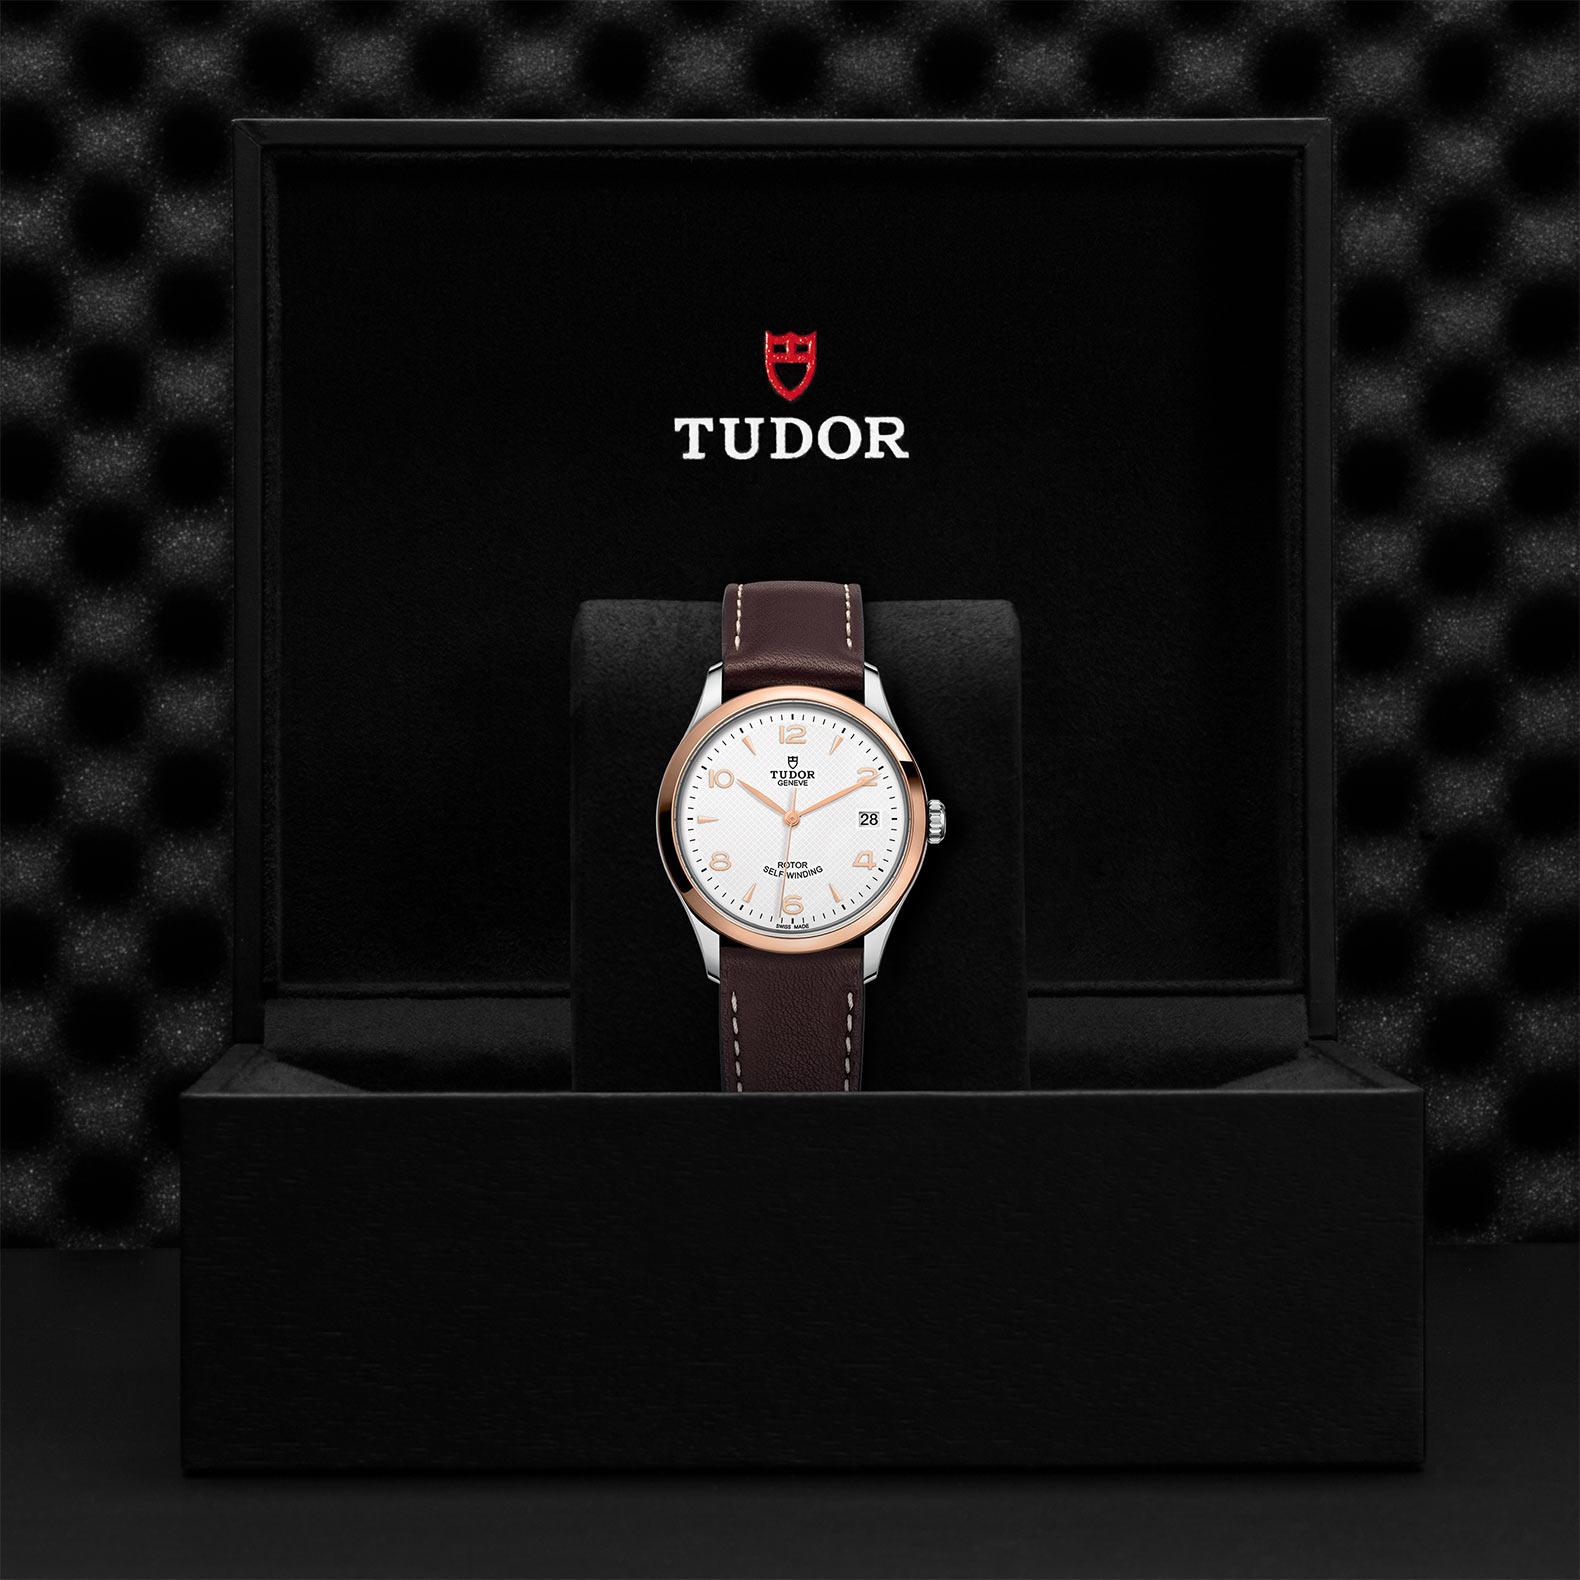 TUDOR 1926 - M91451-0010